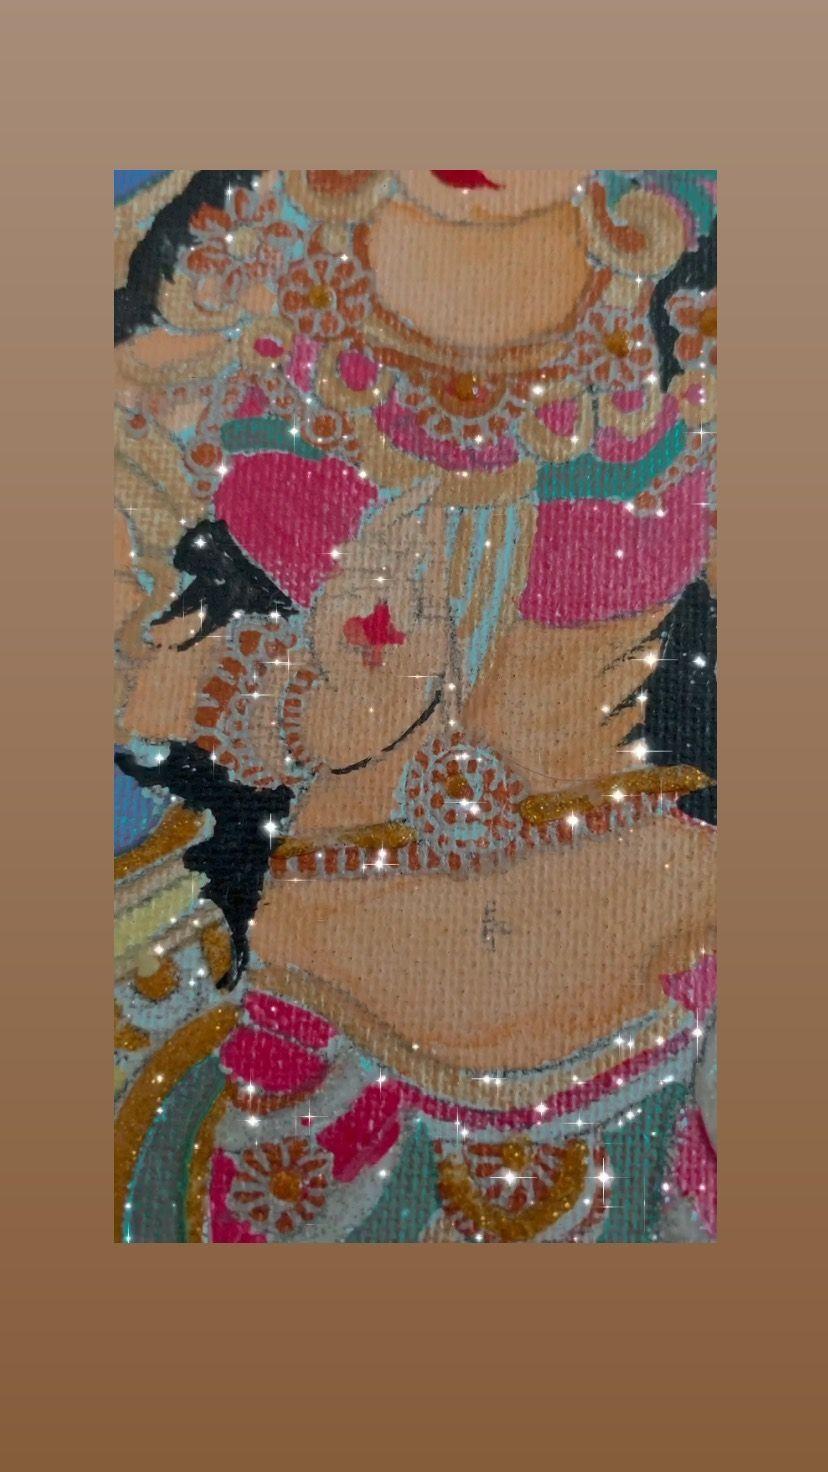 kalopsic_art_ on Instagram: #indianart #murals #artstagram #fevicrylhobbyideas #fevicryl #fevicrylacryliccolours #fevicrylpearlcolours #fevicrylpearlmetalliccolours…